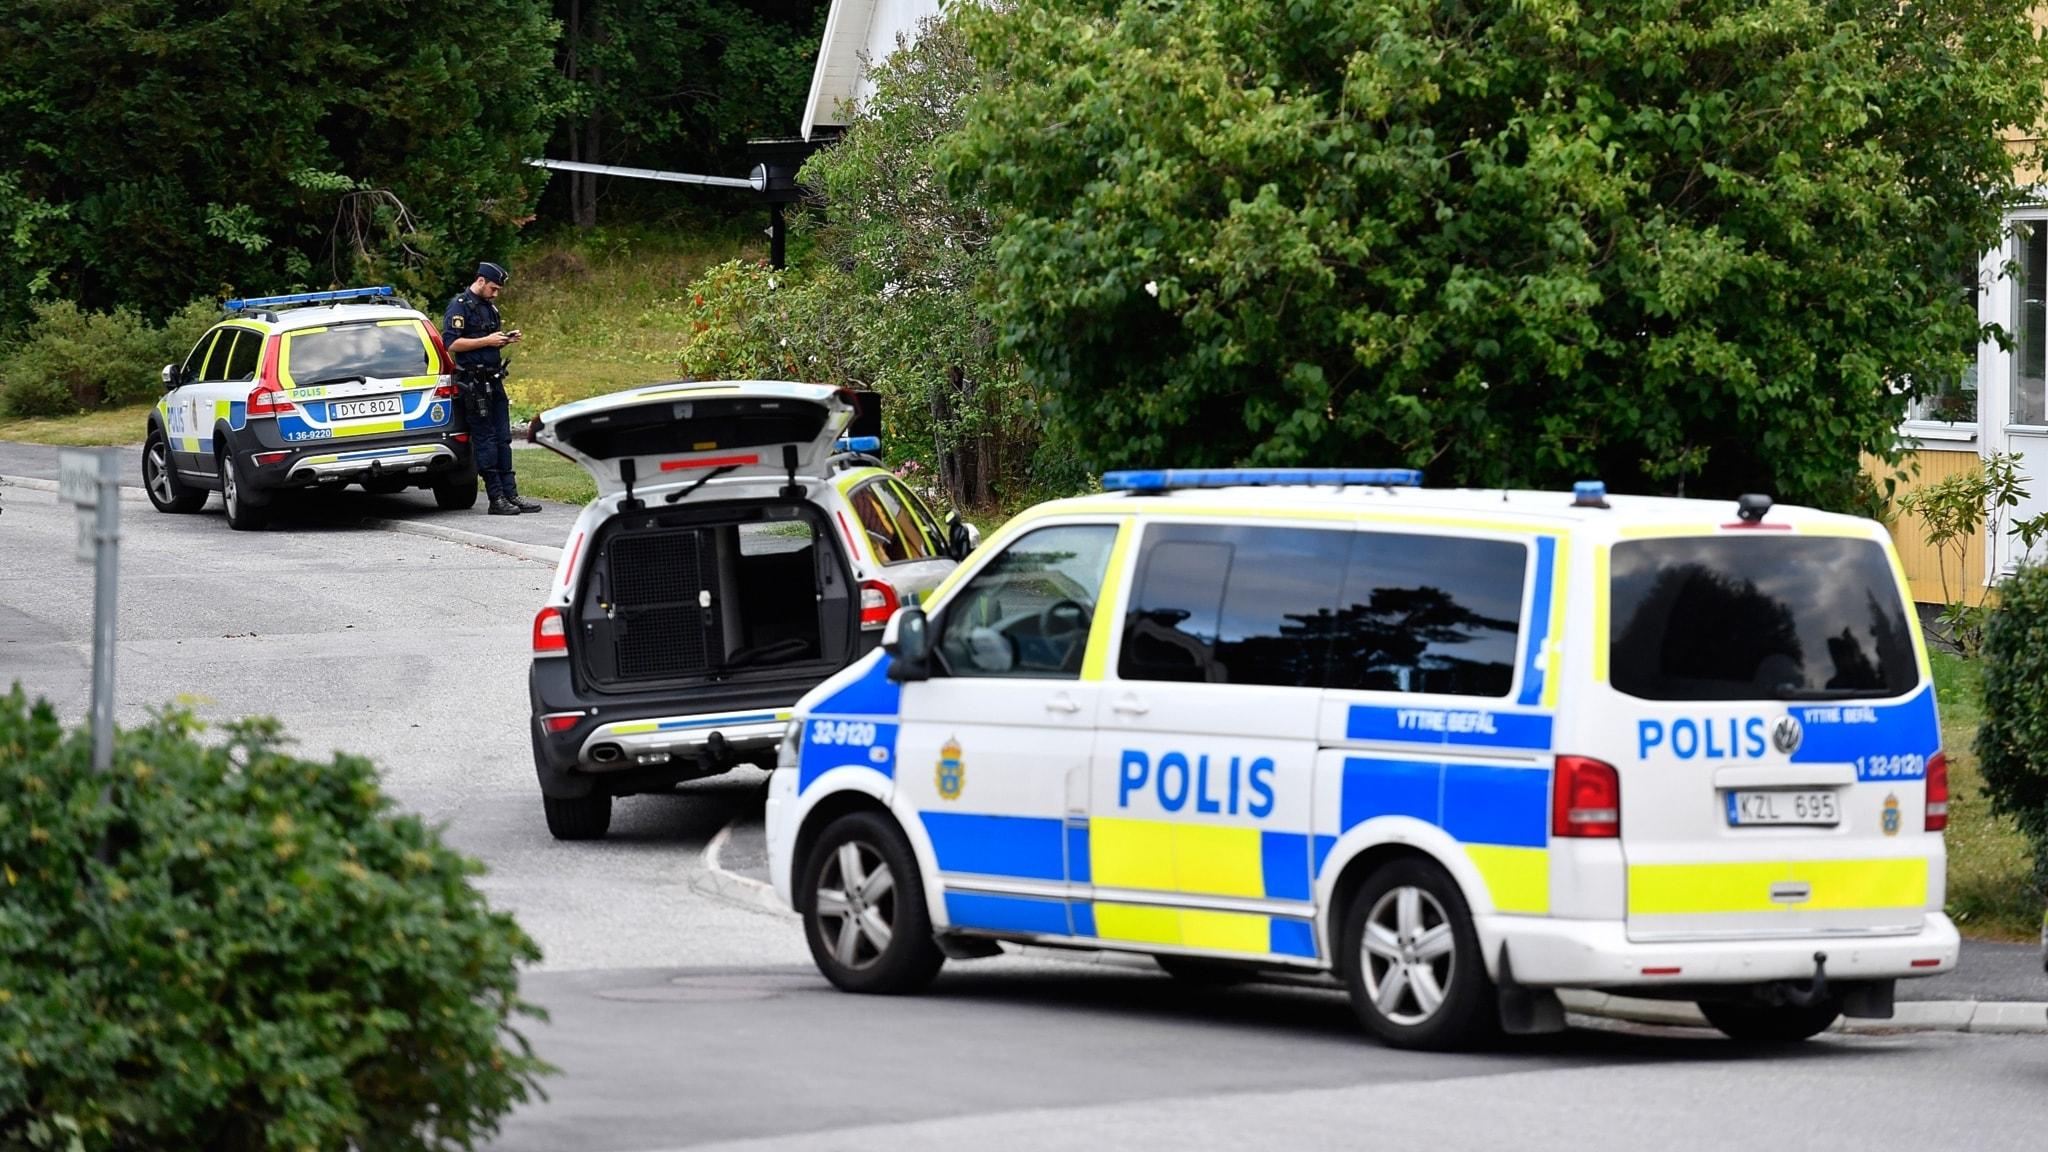 30 juli 2017: Flyktingpojke sköts utanför Stockholm